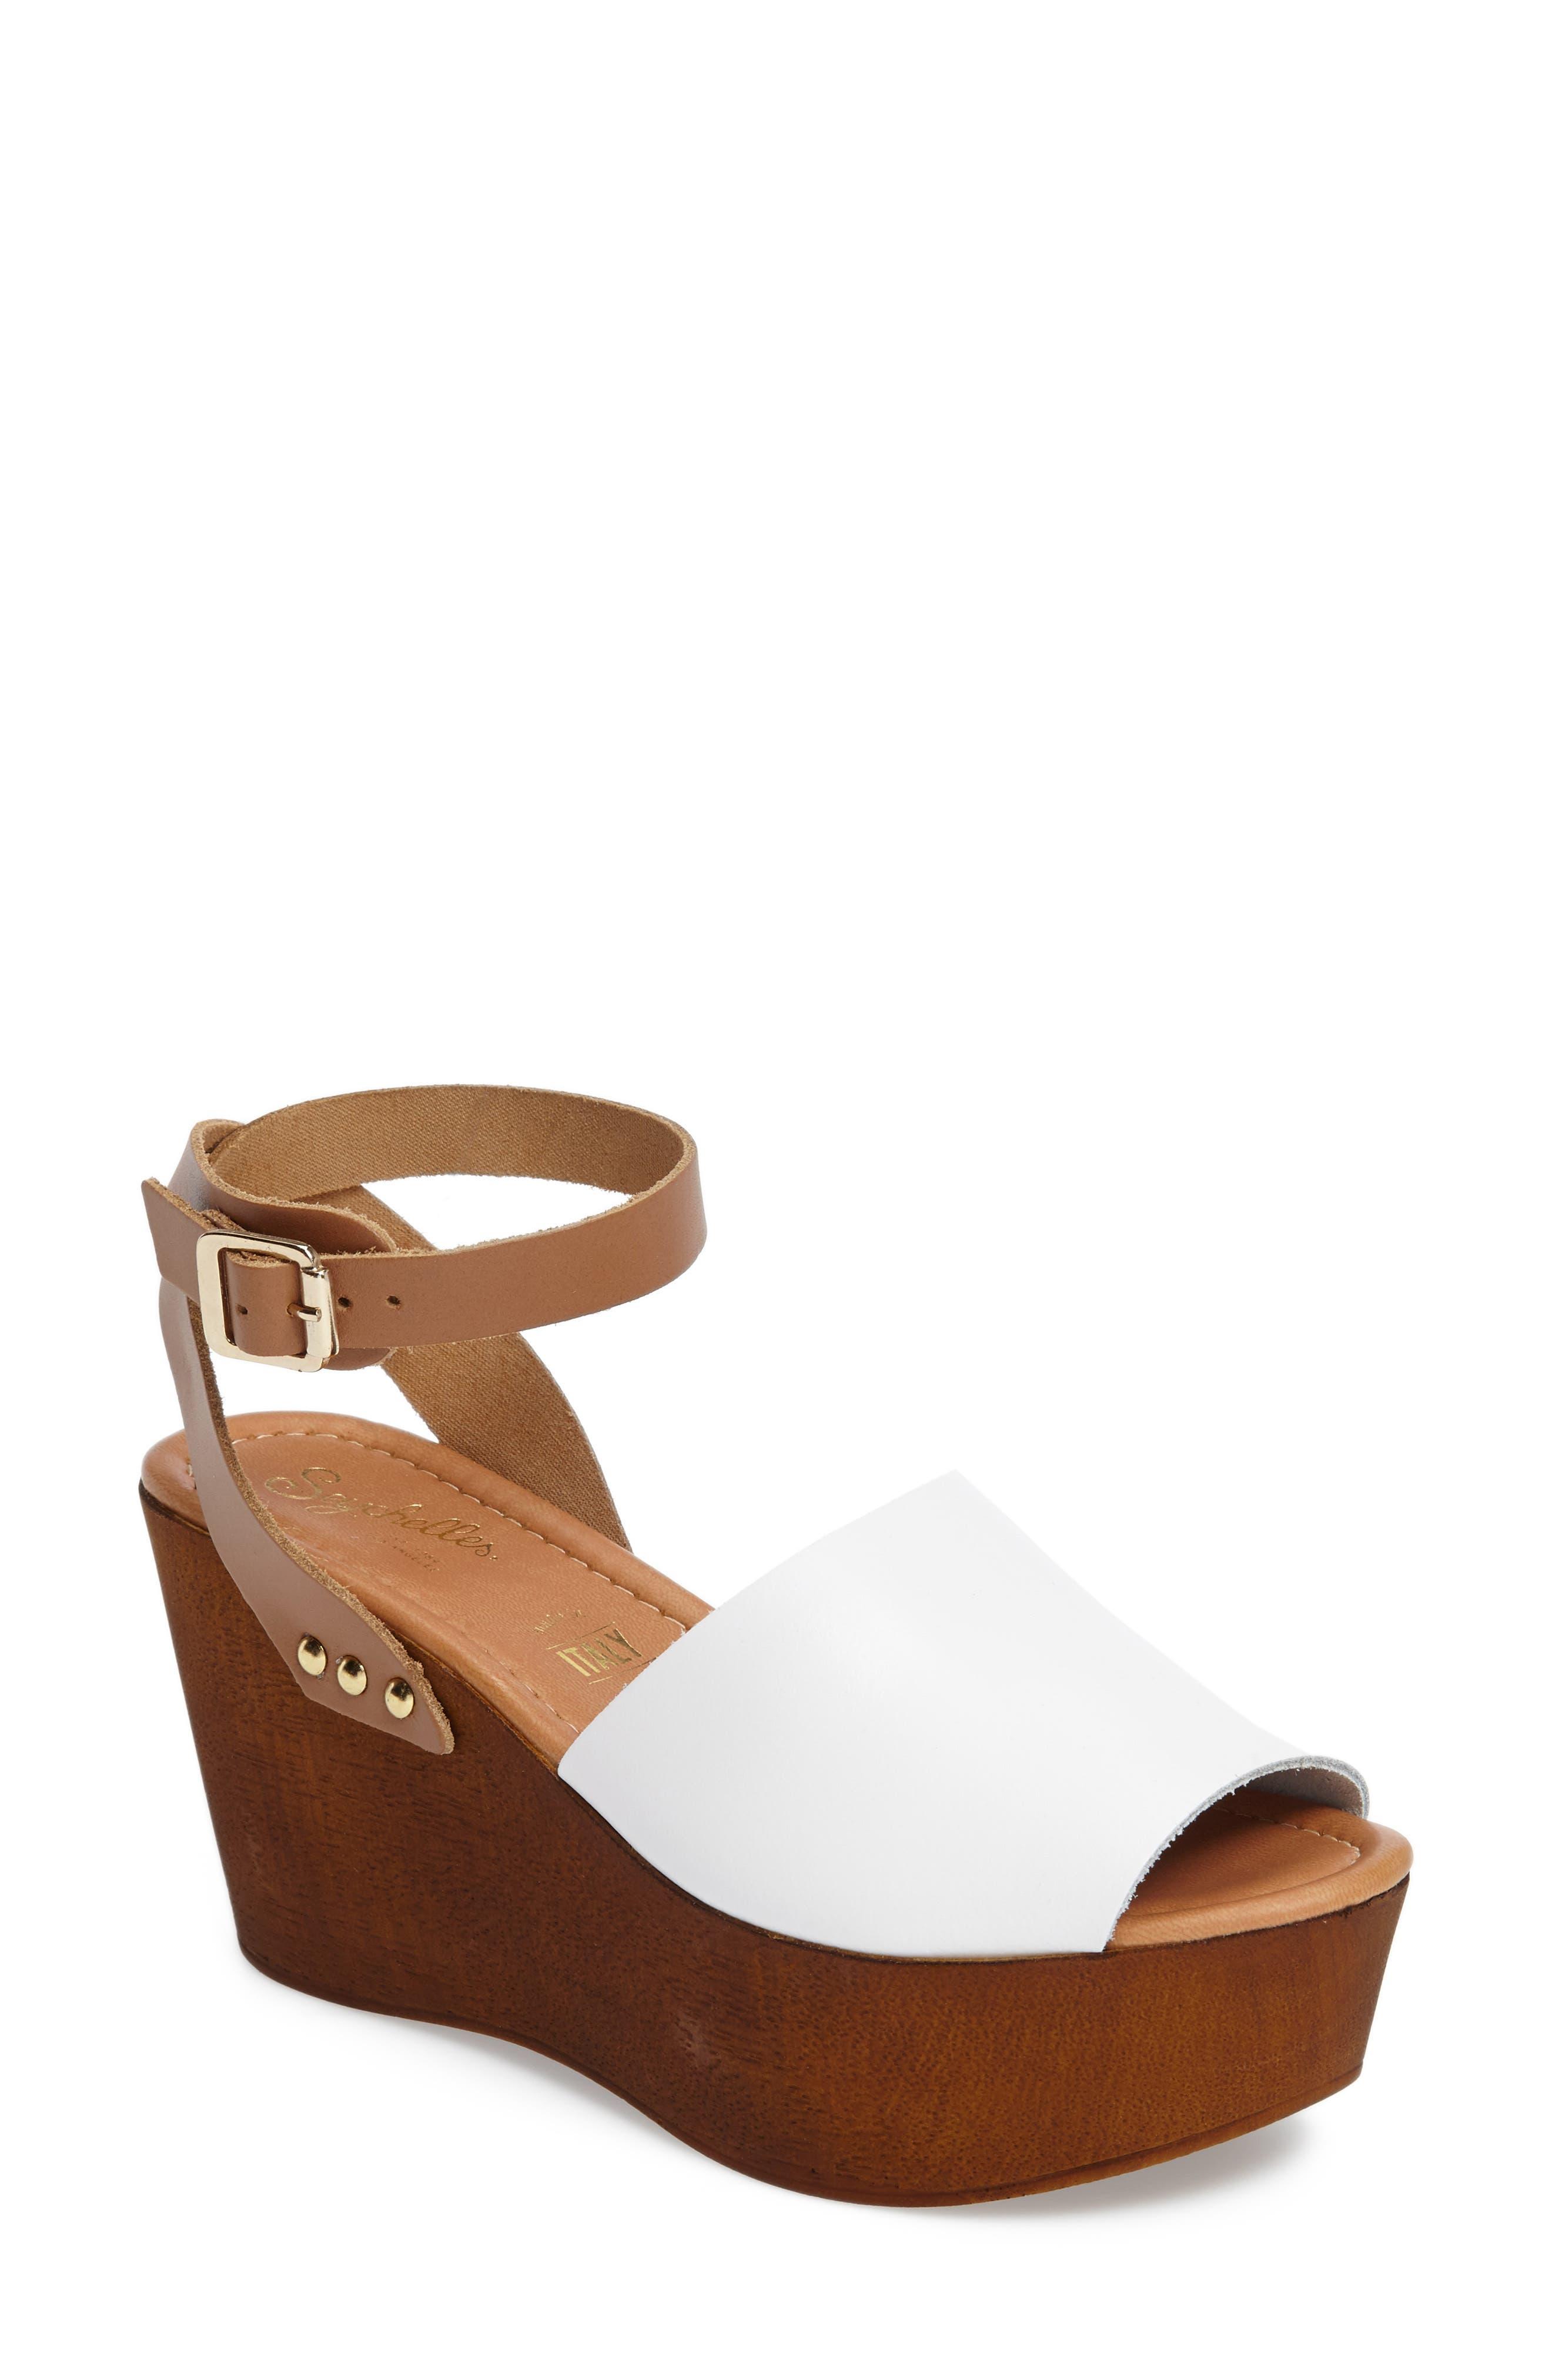 Main Image - Seychelles Platform Wedge Sandal (Women)